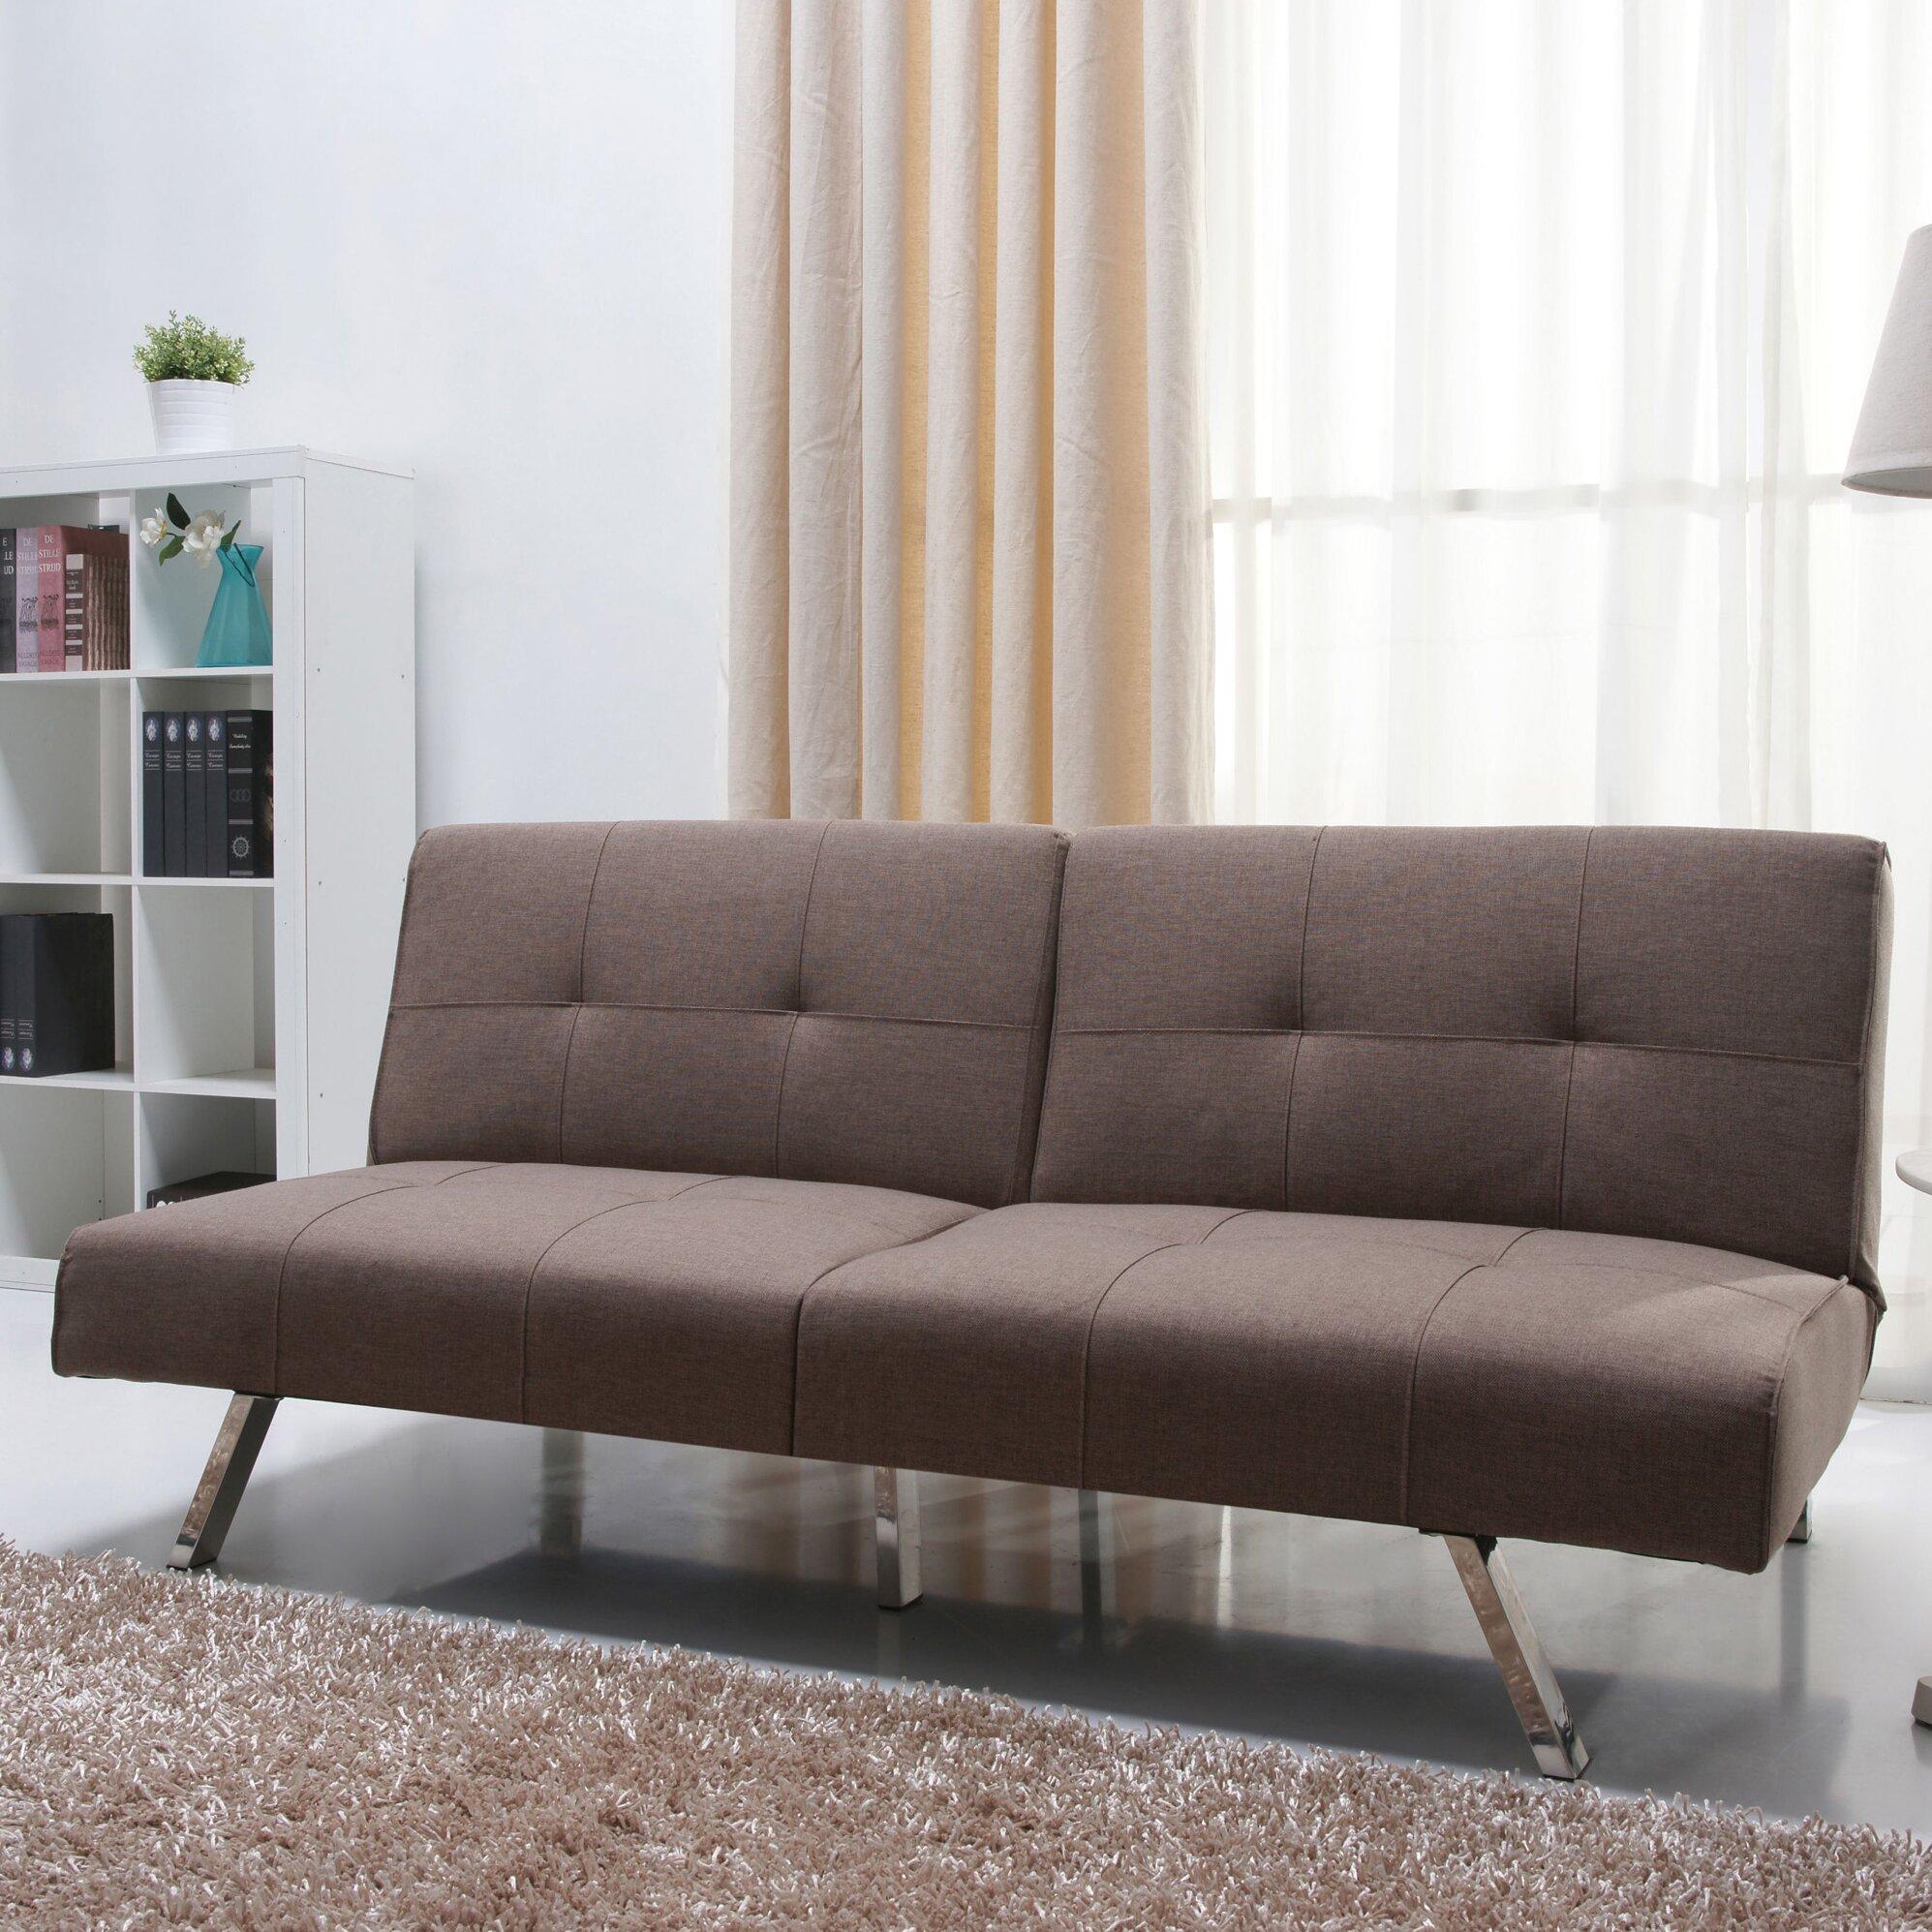 Varick Gallery Rosehill Foldable Futon Sofa Bed Reviews Wayfair